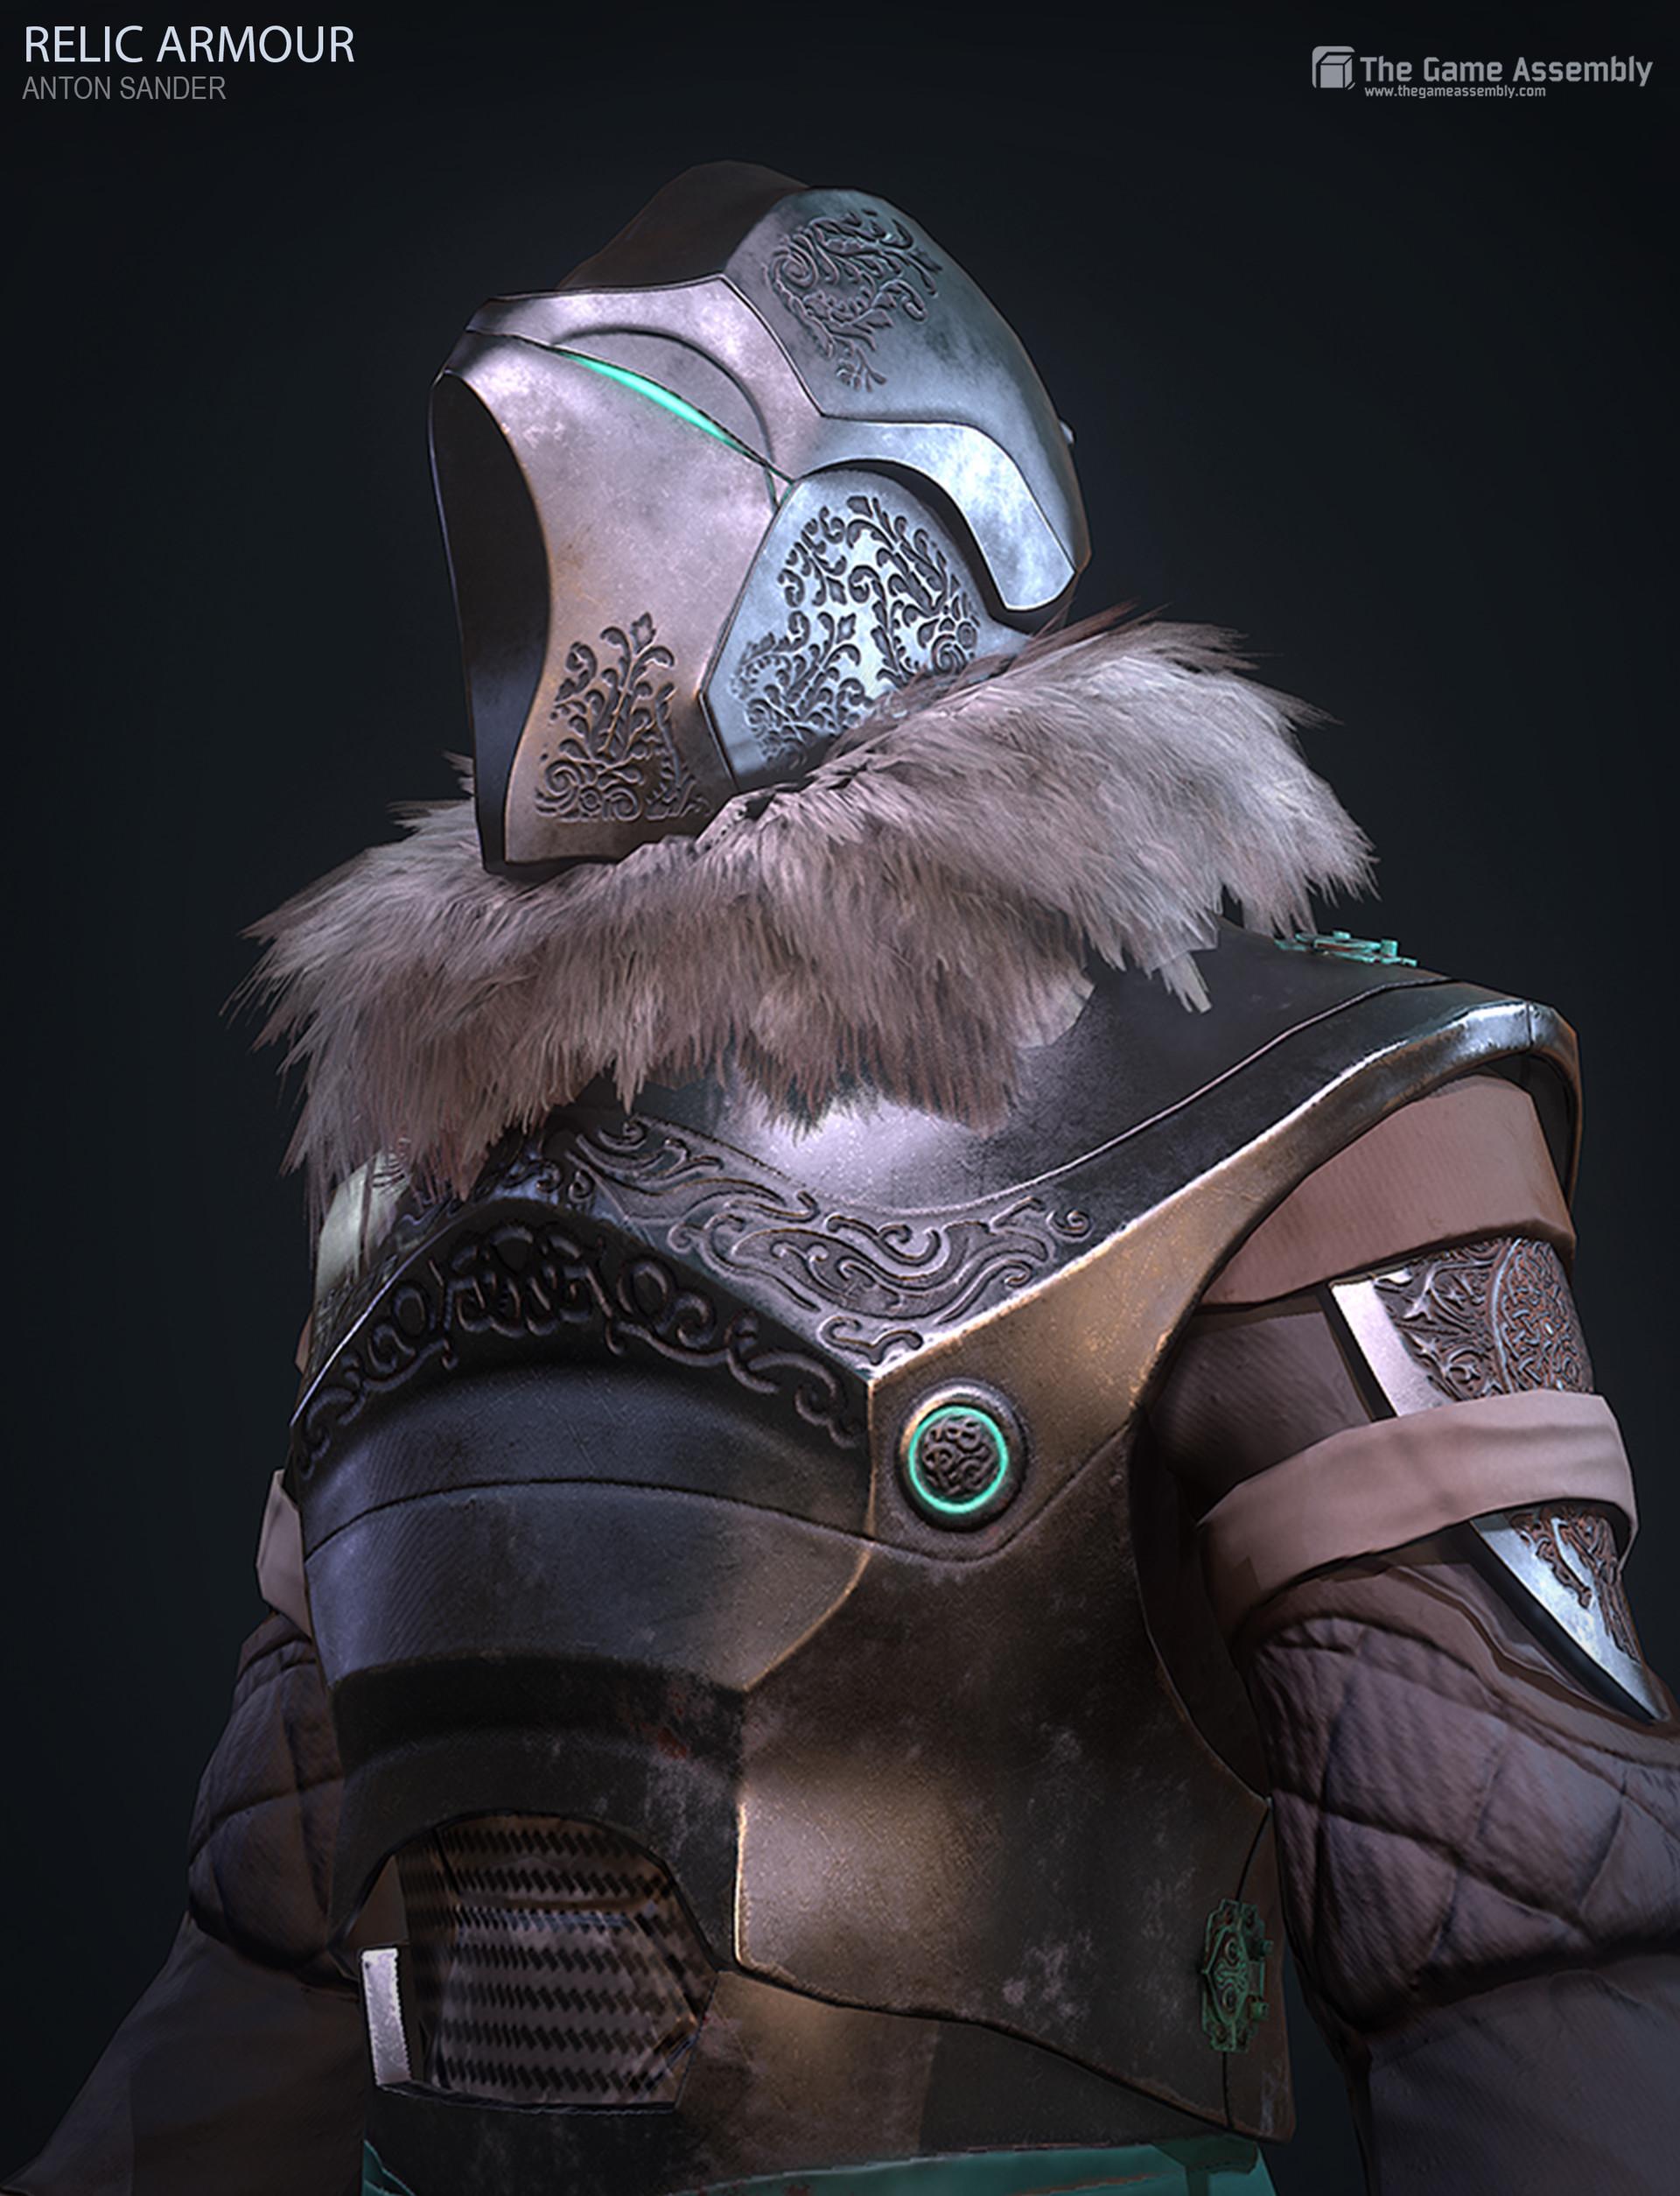 Anton sander relic armour a